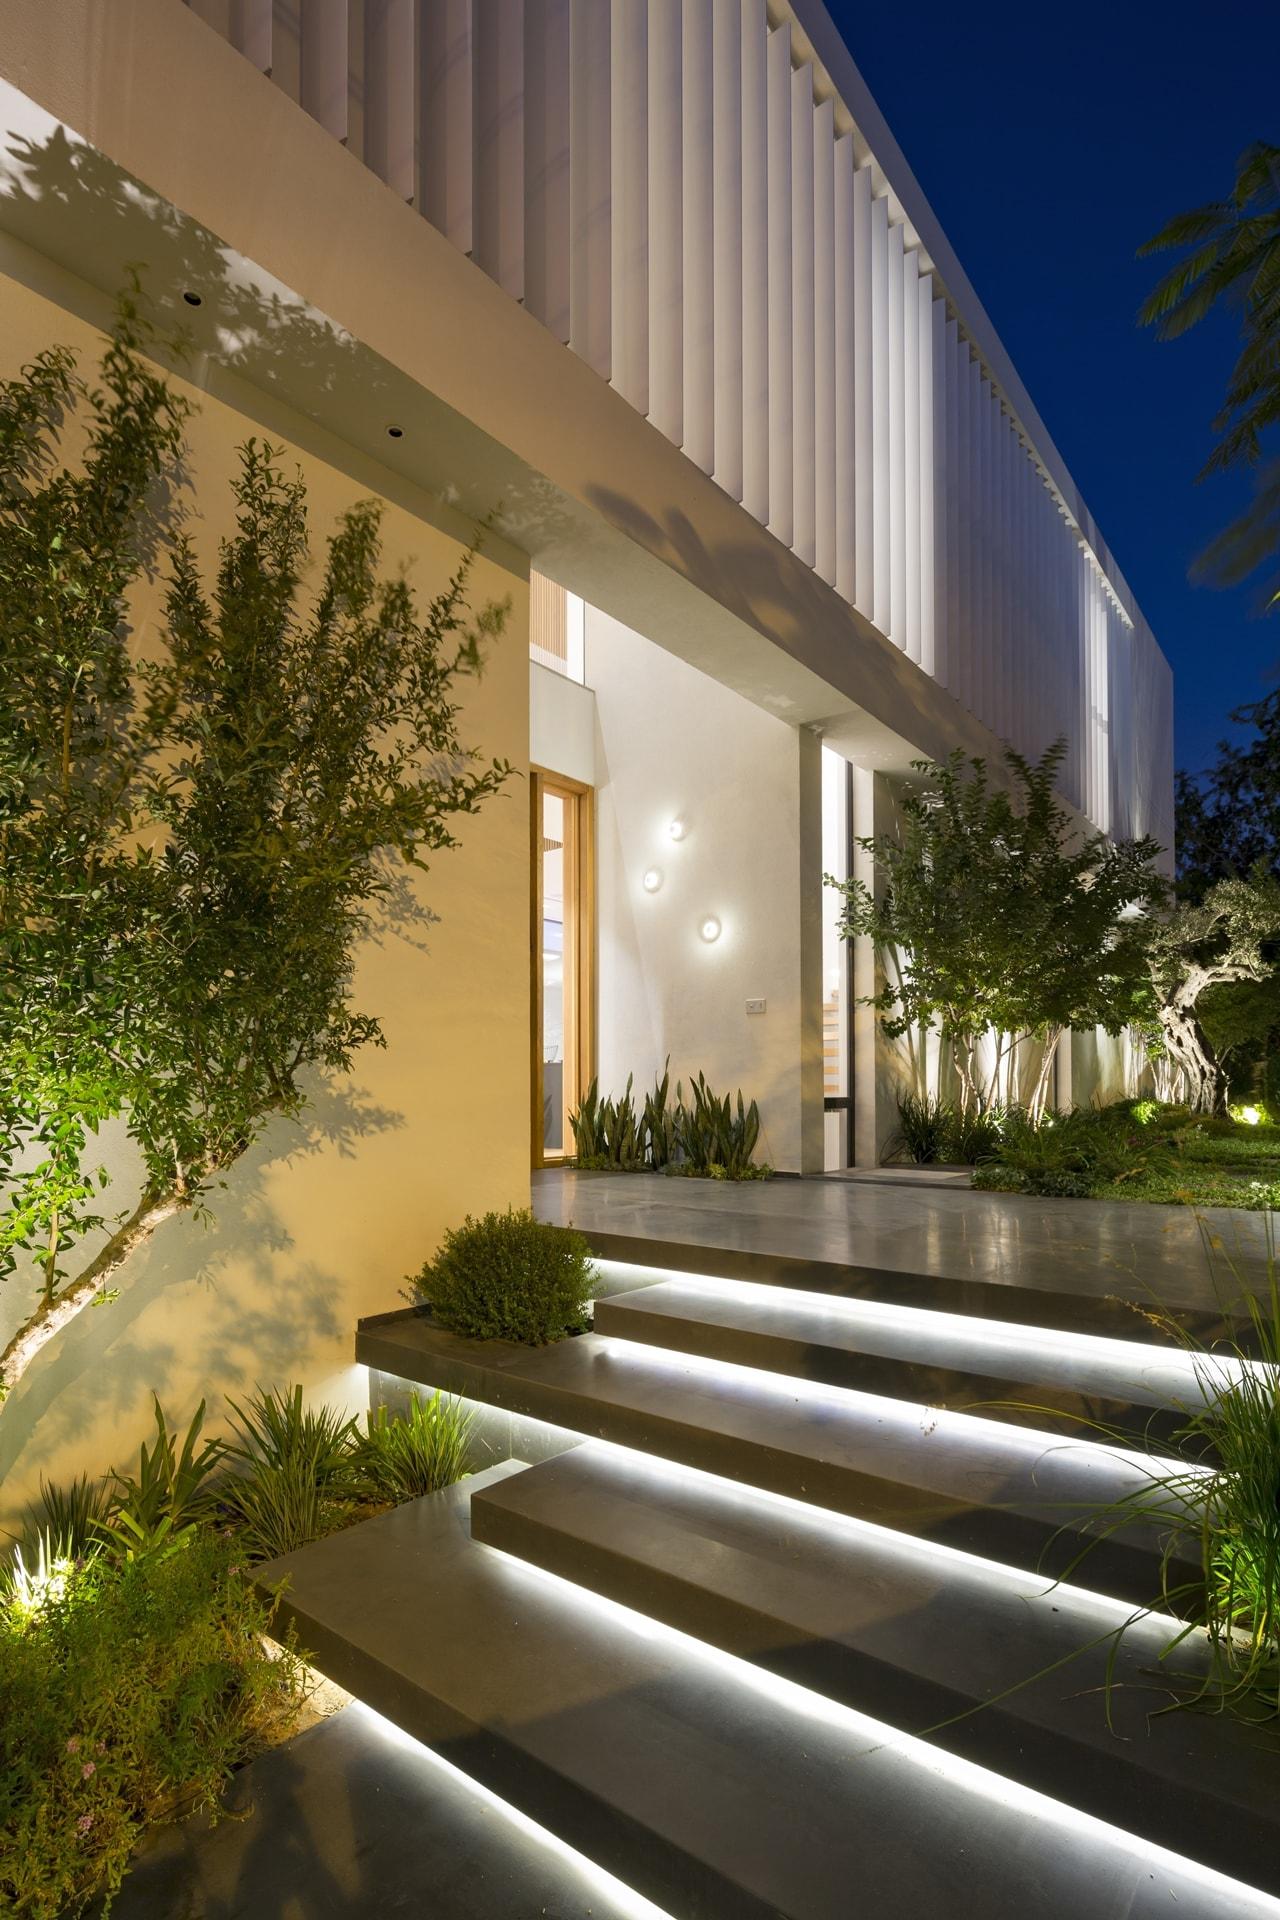 The Best Exterior House Design Ideas  Architecture Beast